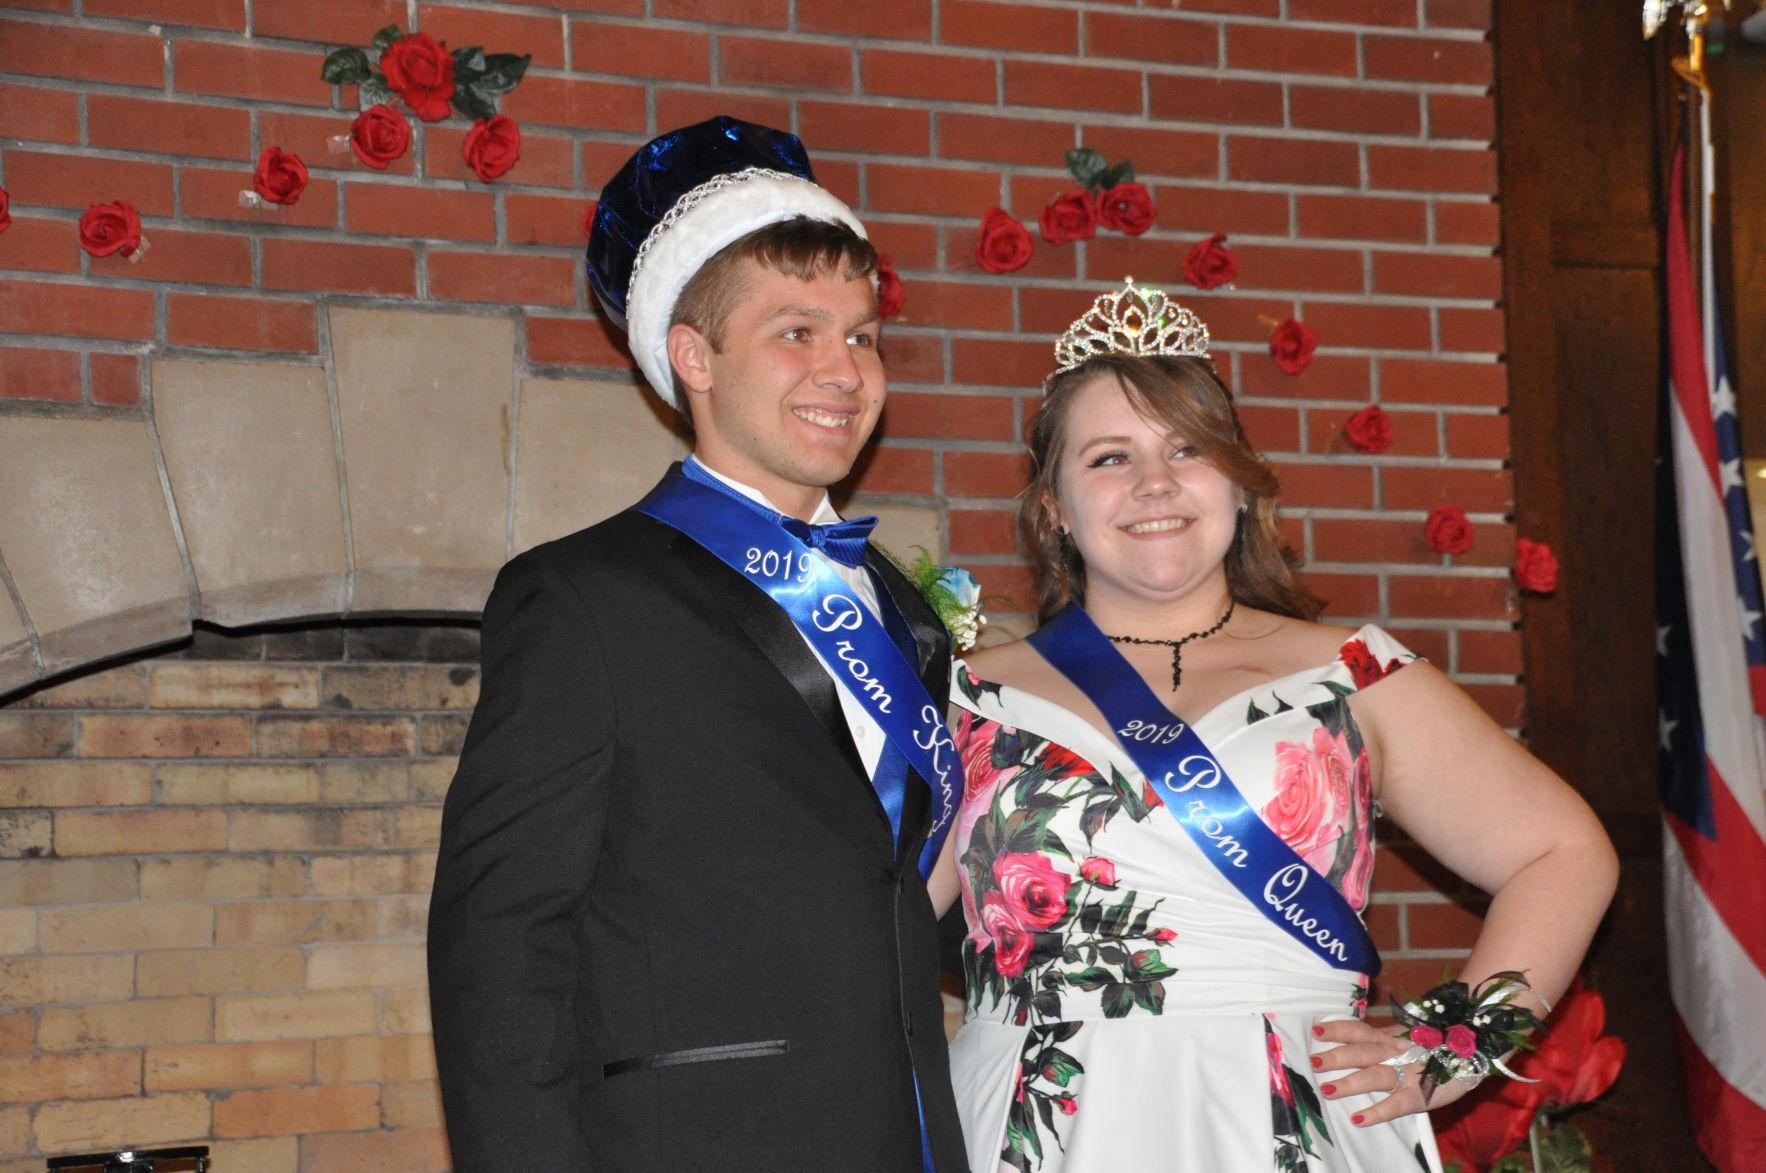 As Danville teen battles brain tumor, community rallies in support